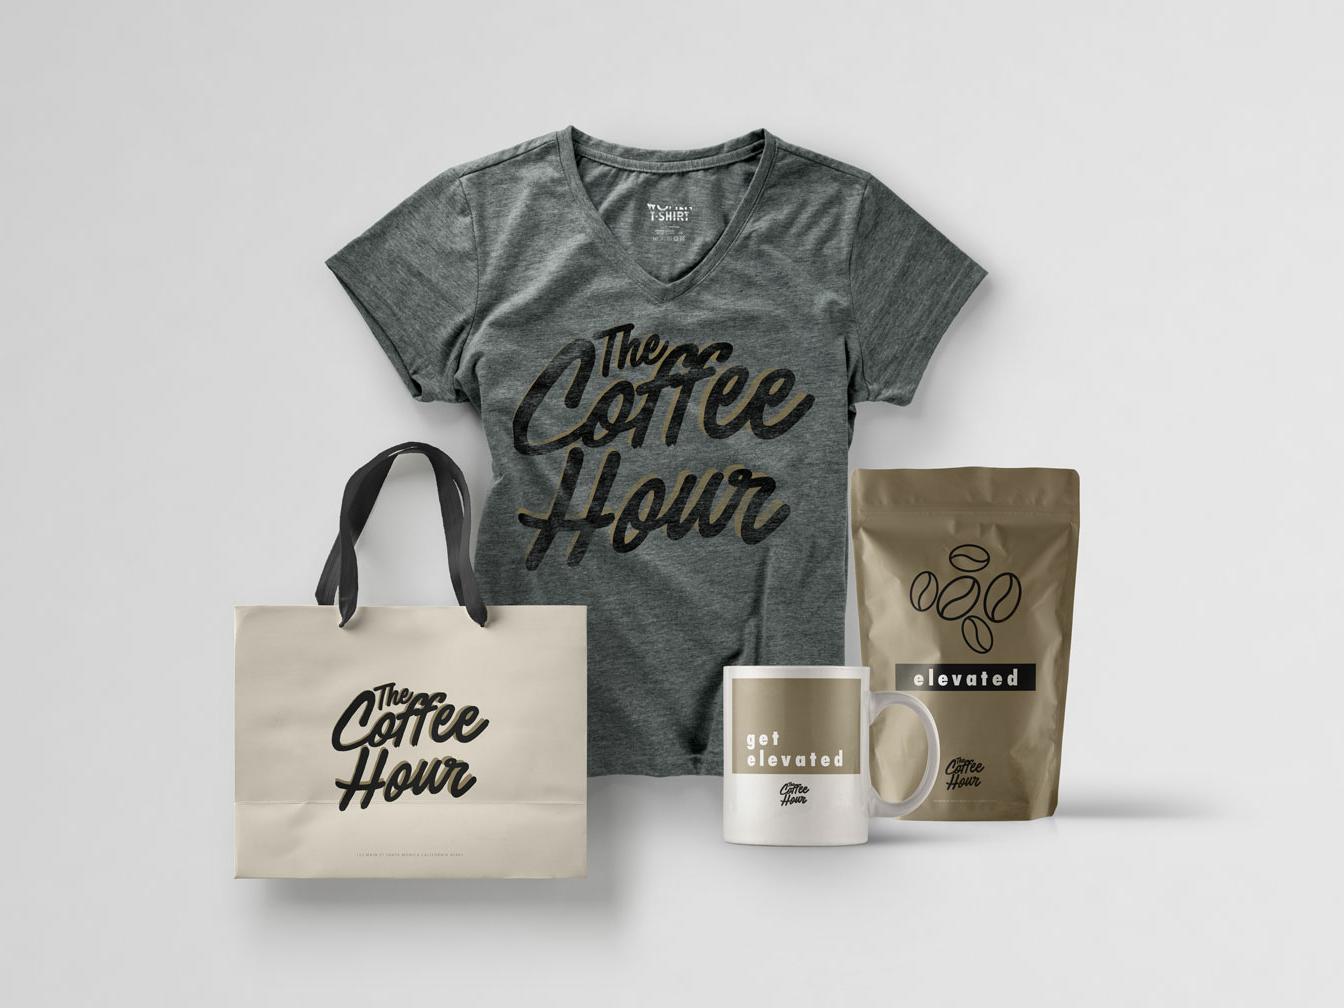 Coffeehour behance 01